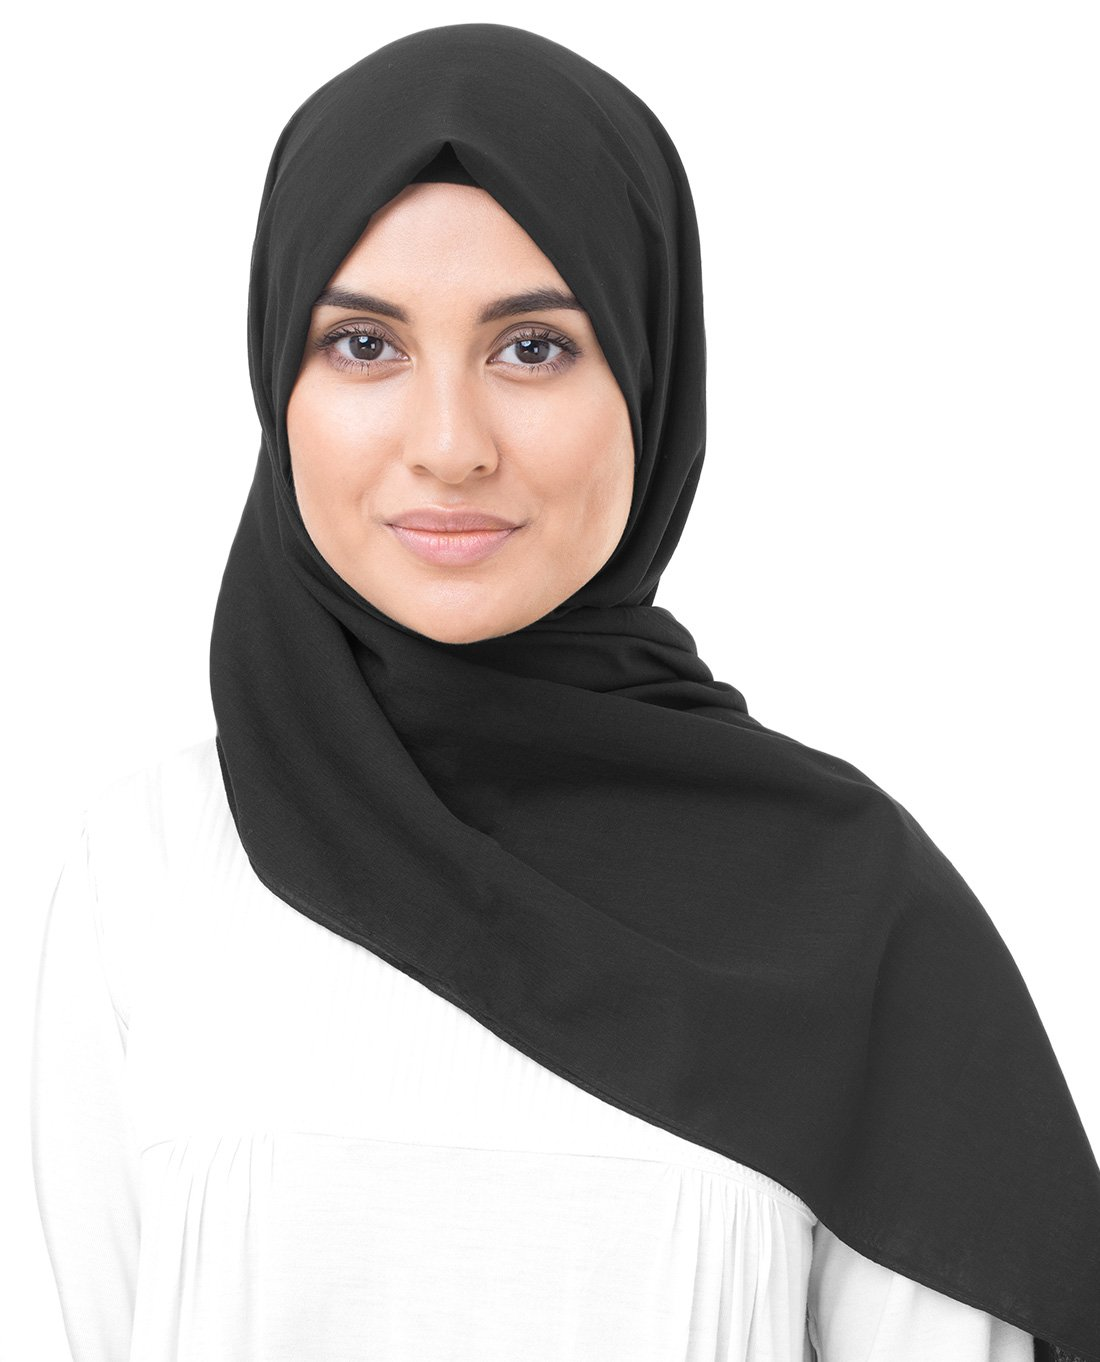 InEssence Jet Black Cotton Voile Scarf Women Girls Wrap Large Size Hijab